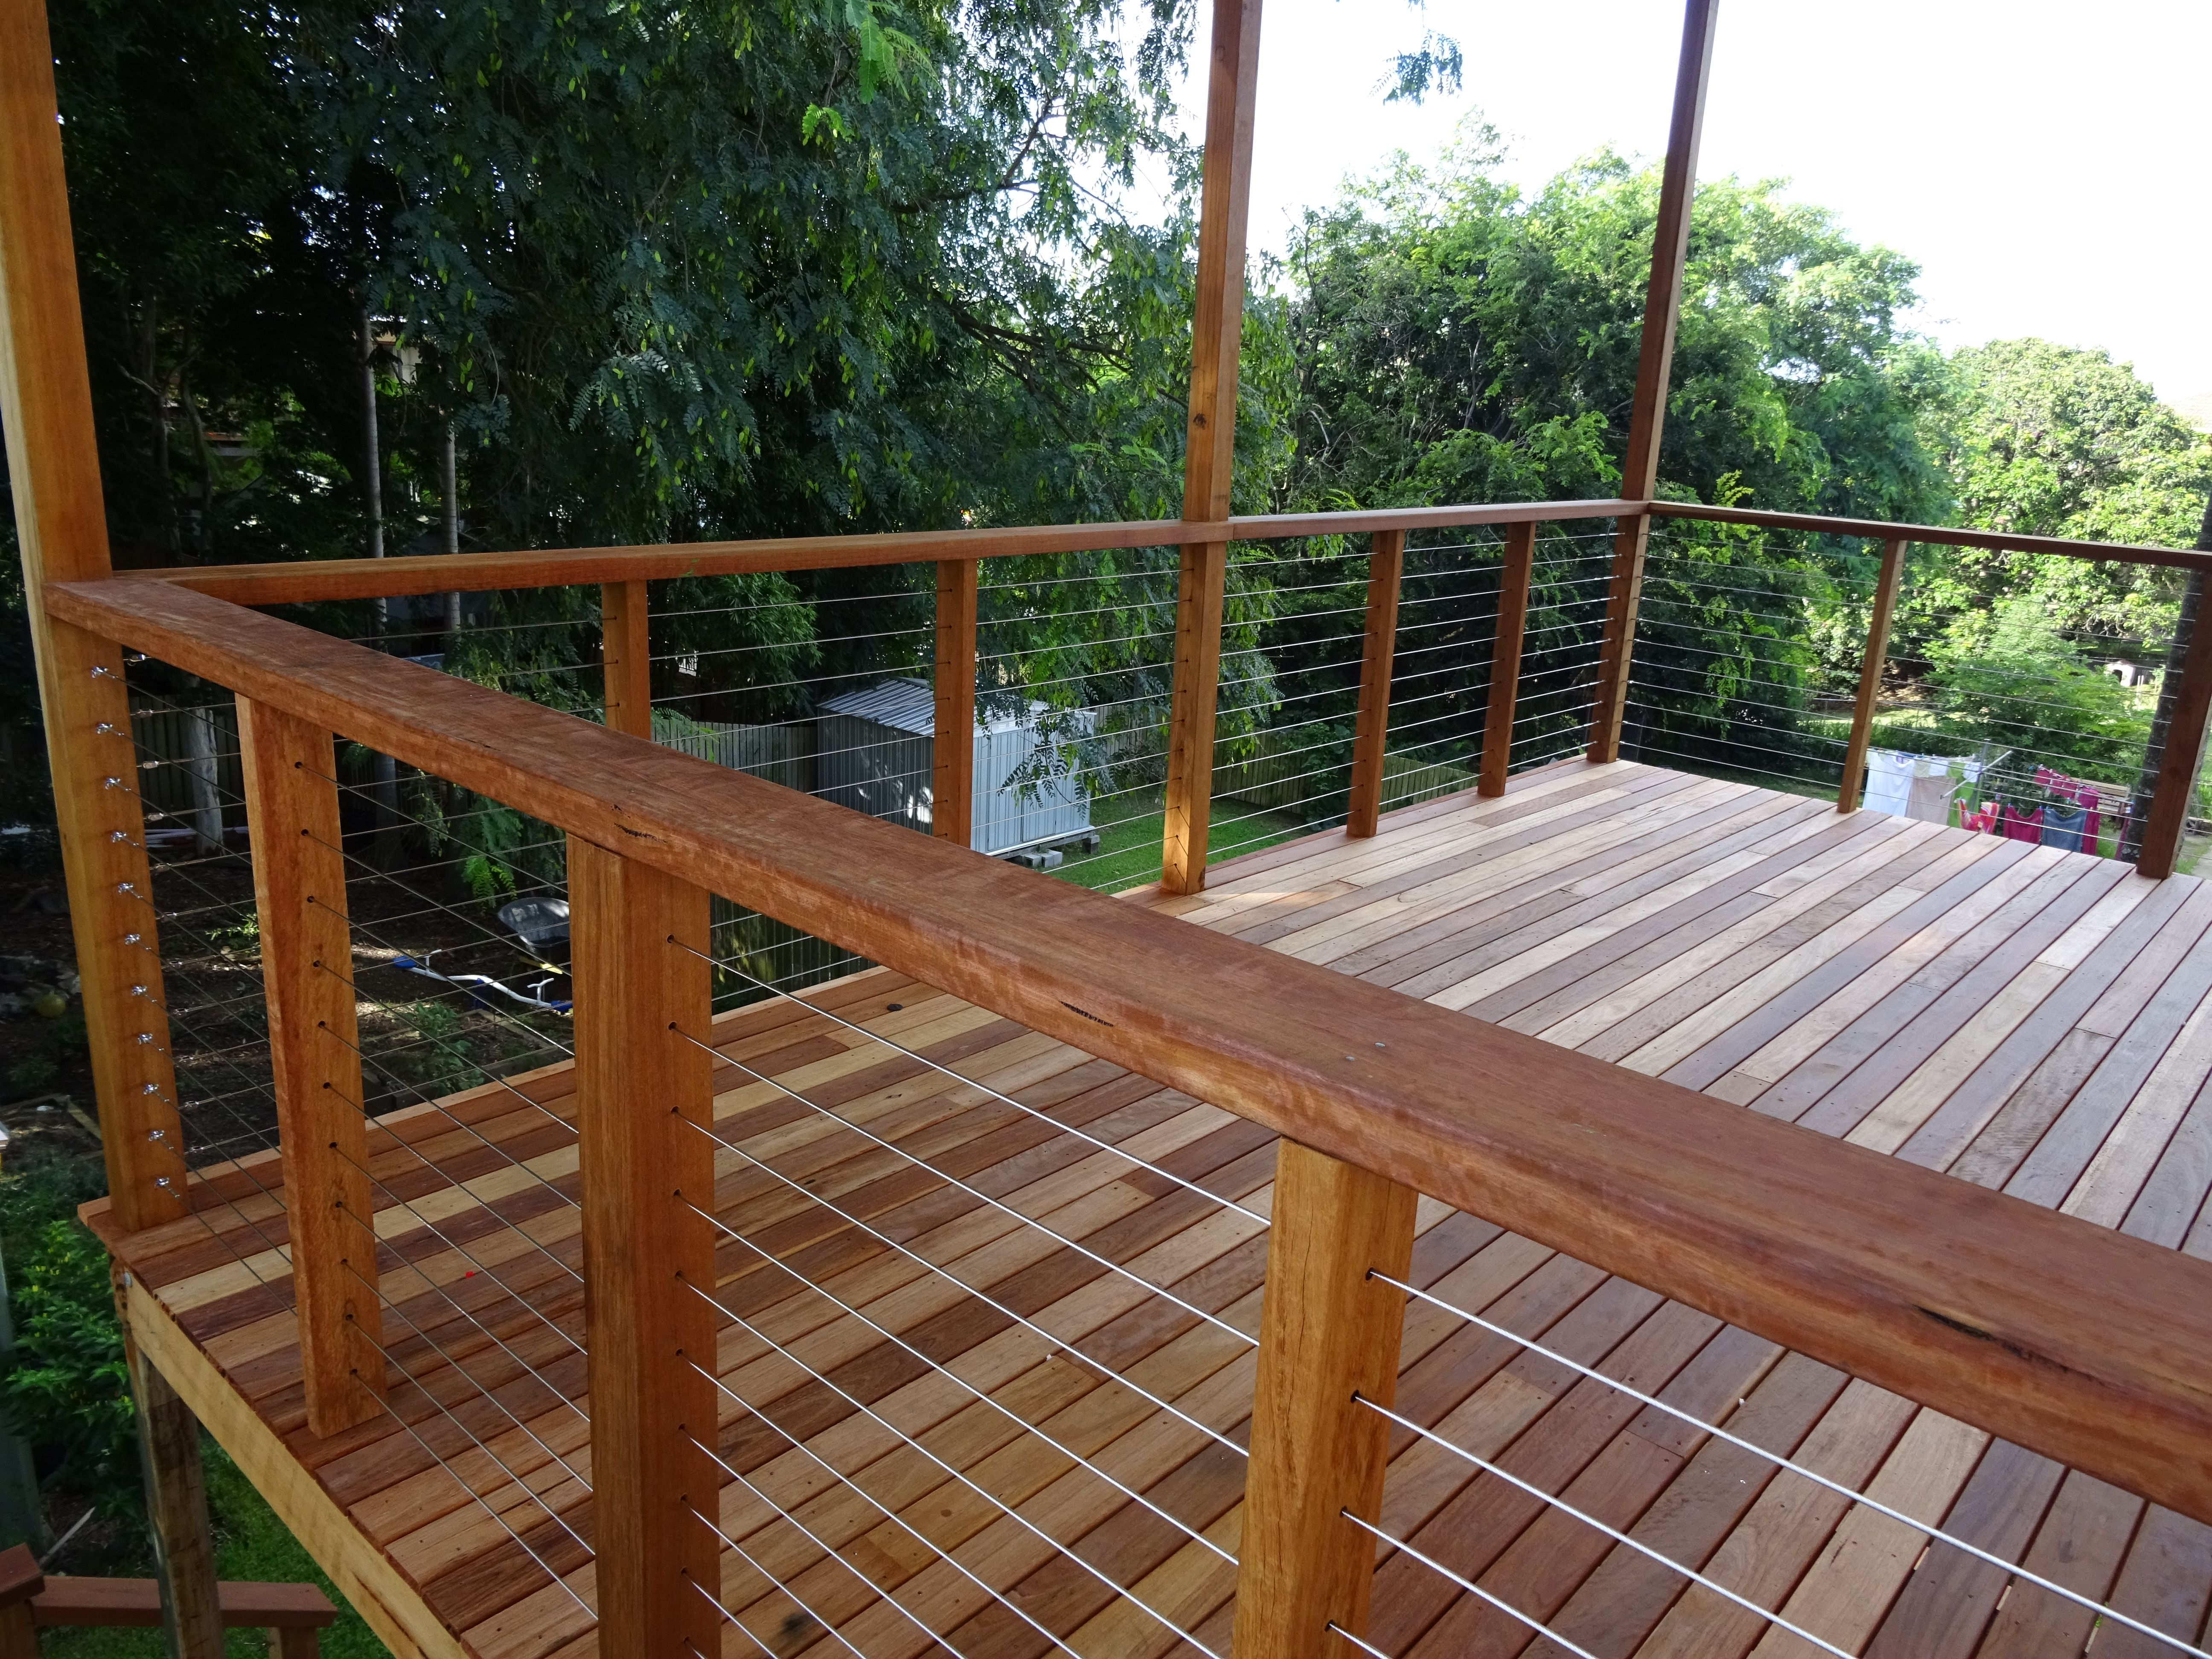 Http Www Allwedoisdecks Com Au Queensland Grown Hardwood Sustainable And Local Patio Deck Designs Timber Deck Deck Designs Backyard